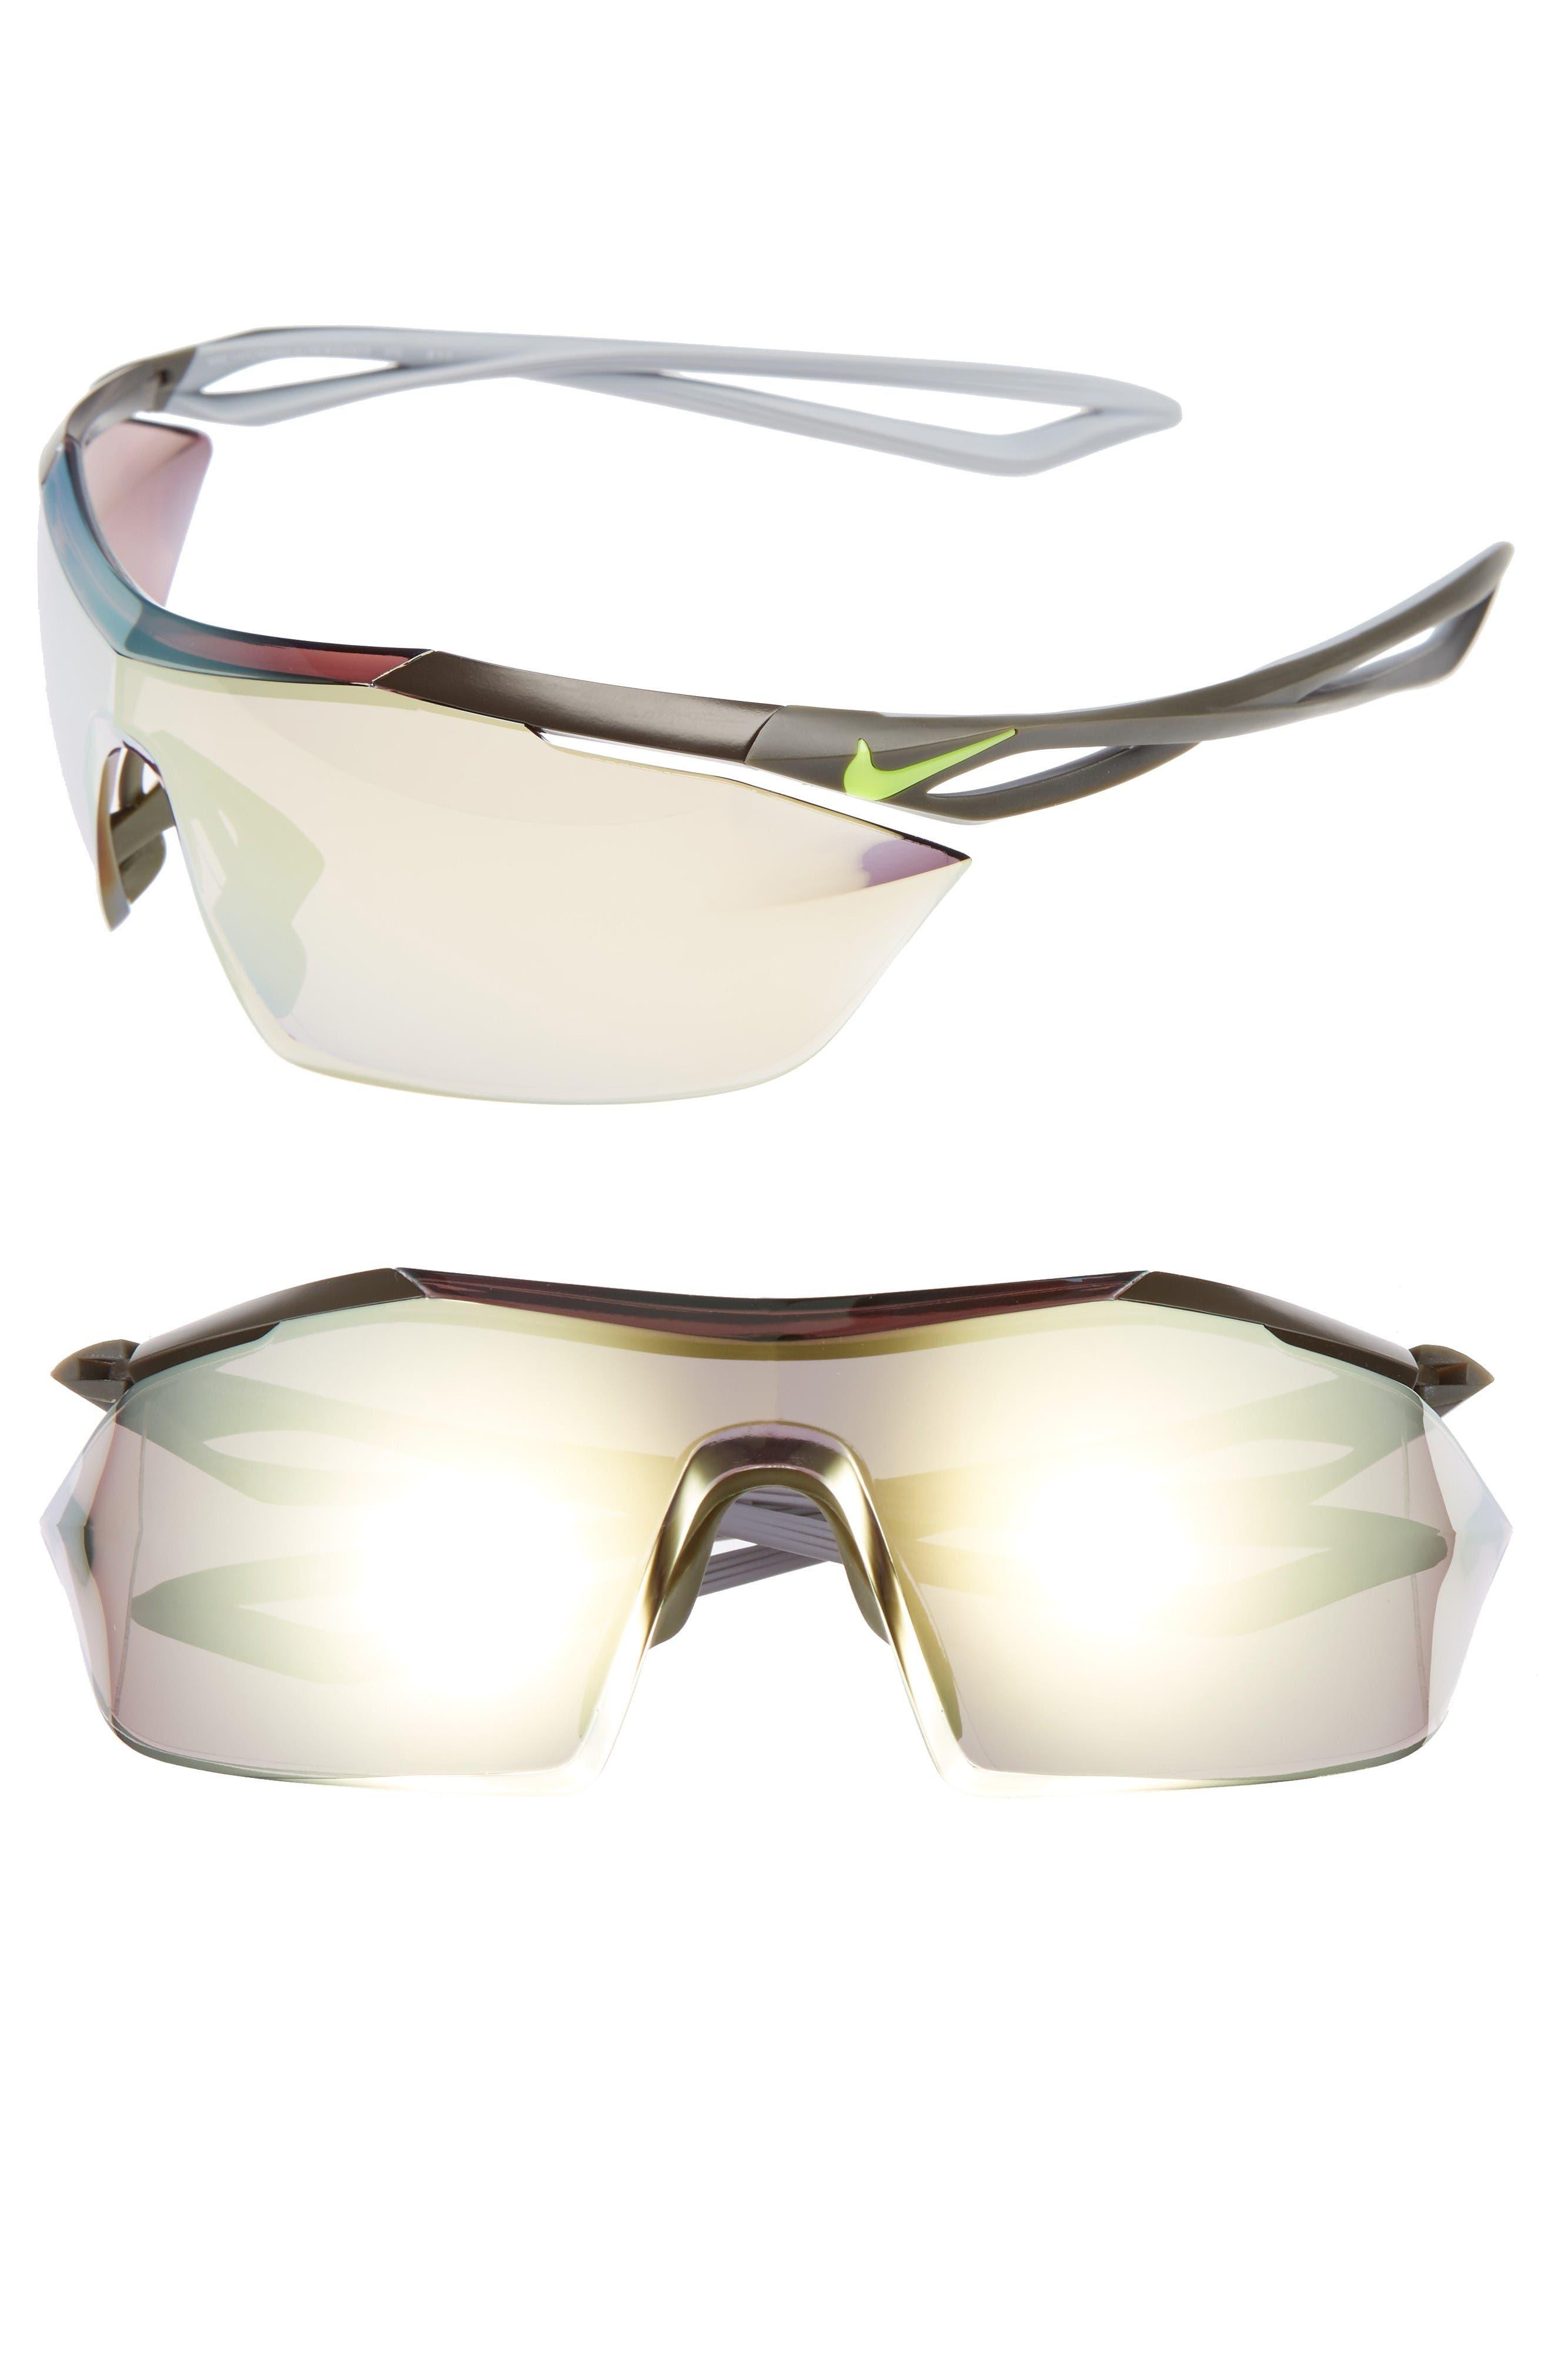 Vaporwing Elite 90mm Running Sunglasses,                             Main thumbnail 1, color,                             Cargo Khaki/ Volt